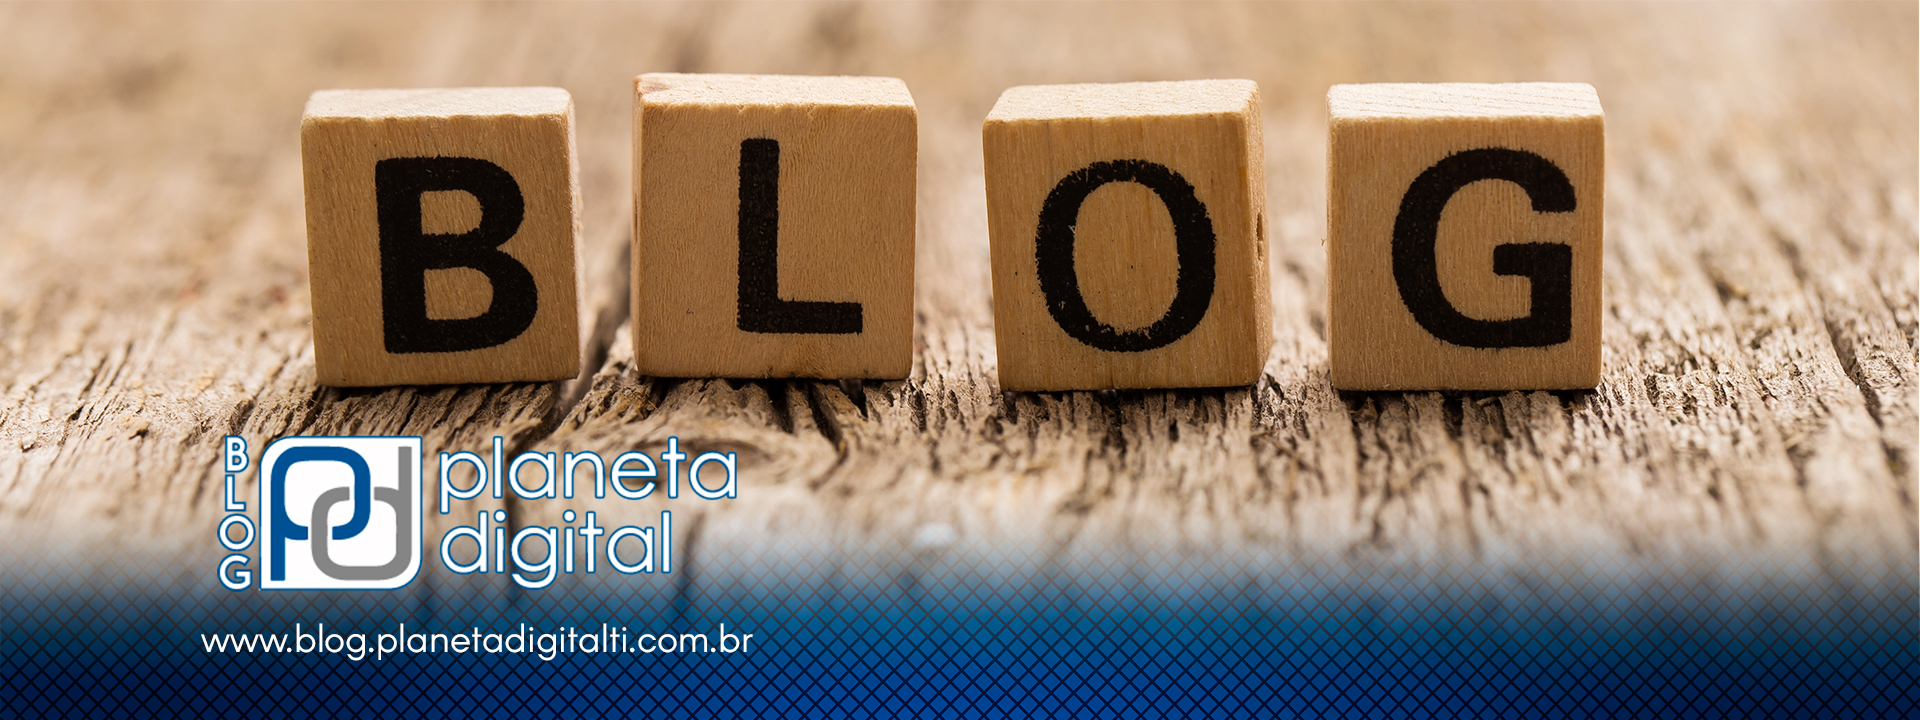 Blog-Planeta_Digital_TI-bg1